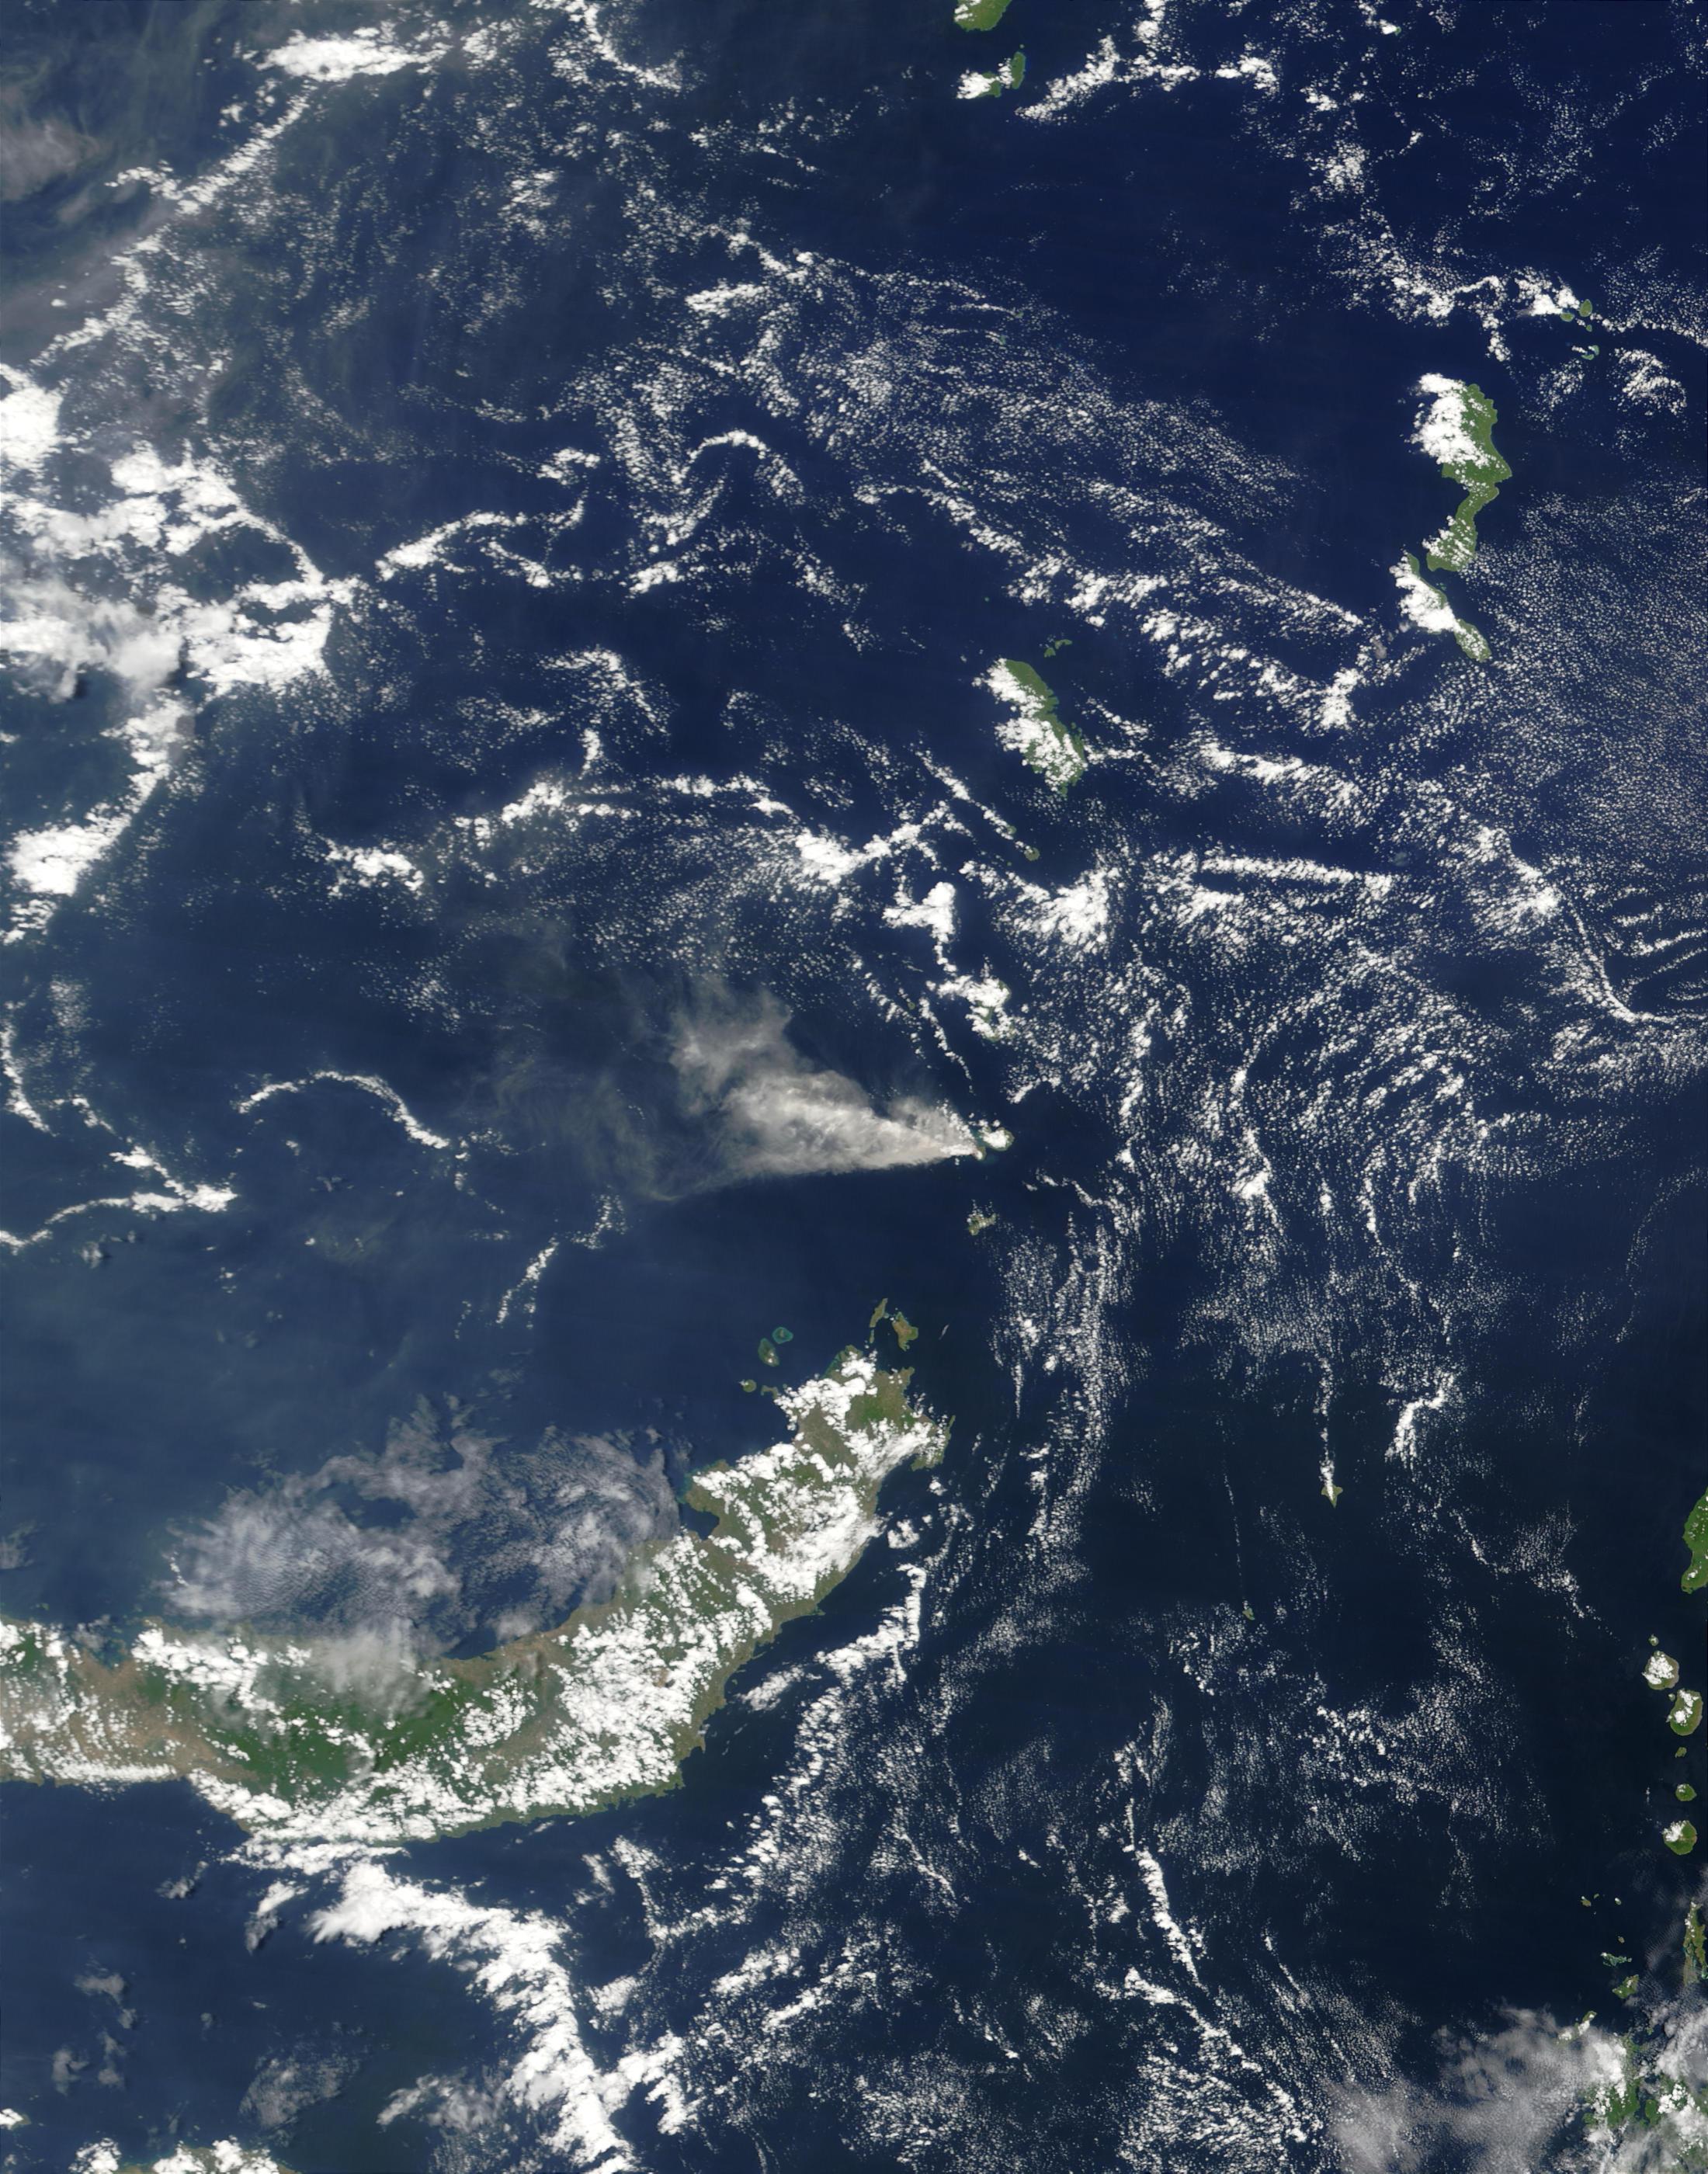 Erupción del volcán Ruang, Indonesia